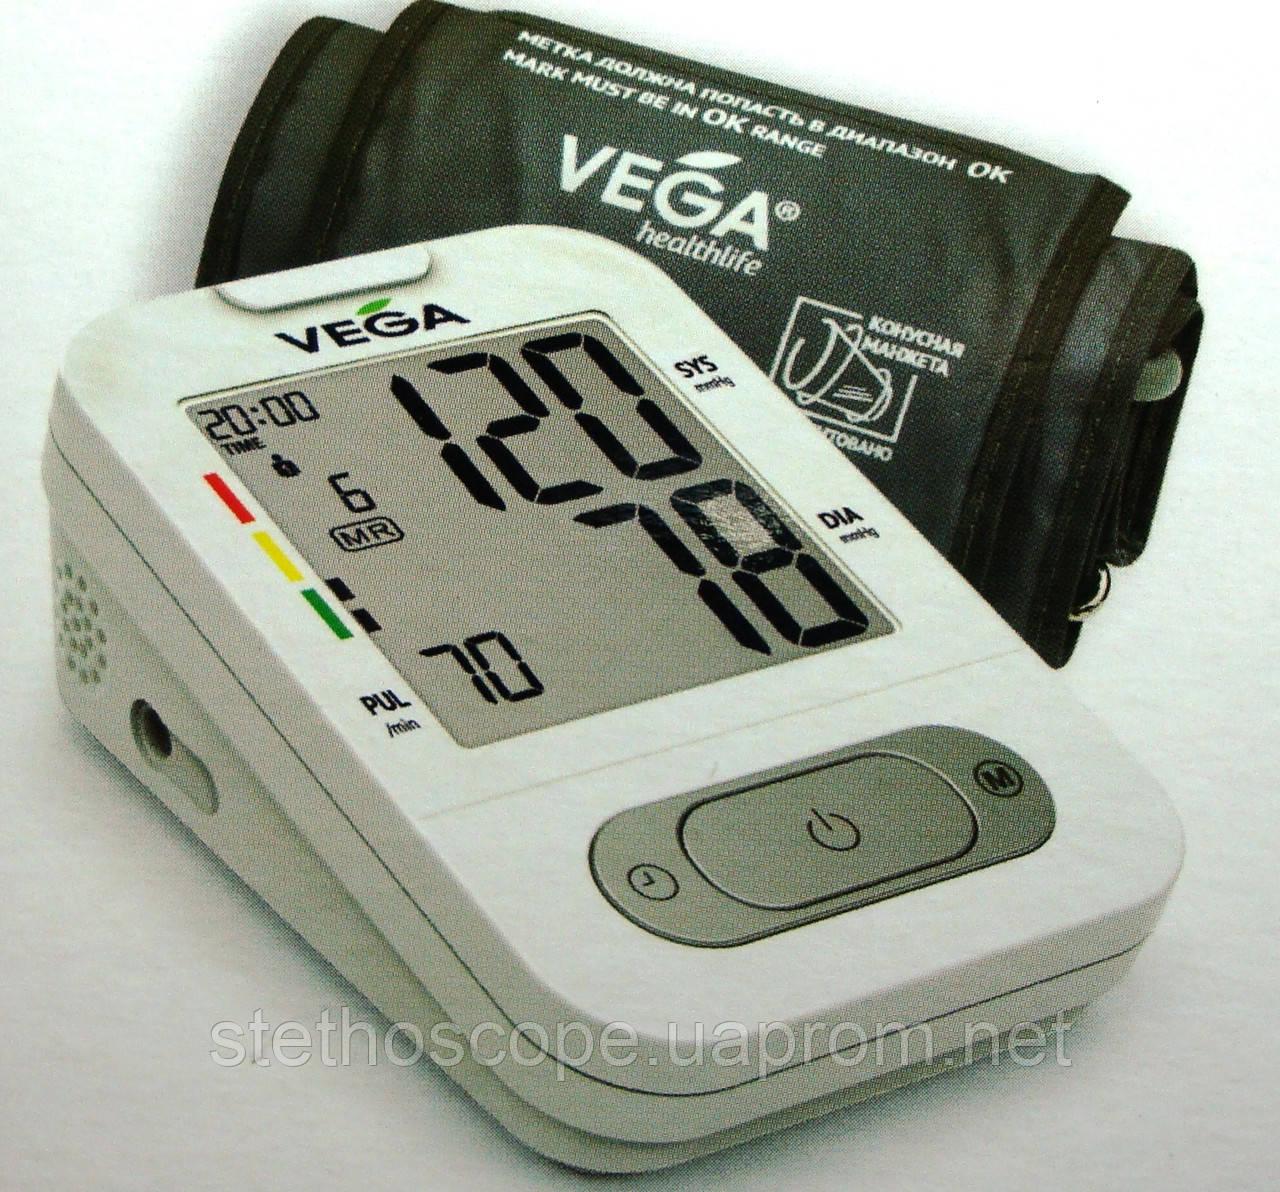 Автоматичний тонометр на плече VEGA - VA-350 індикатор аритмії манжета 22-42 див.